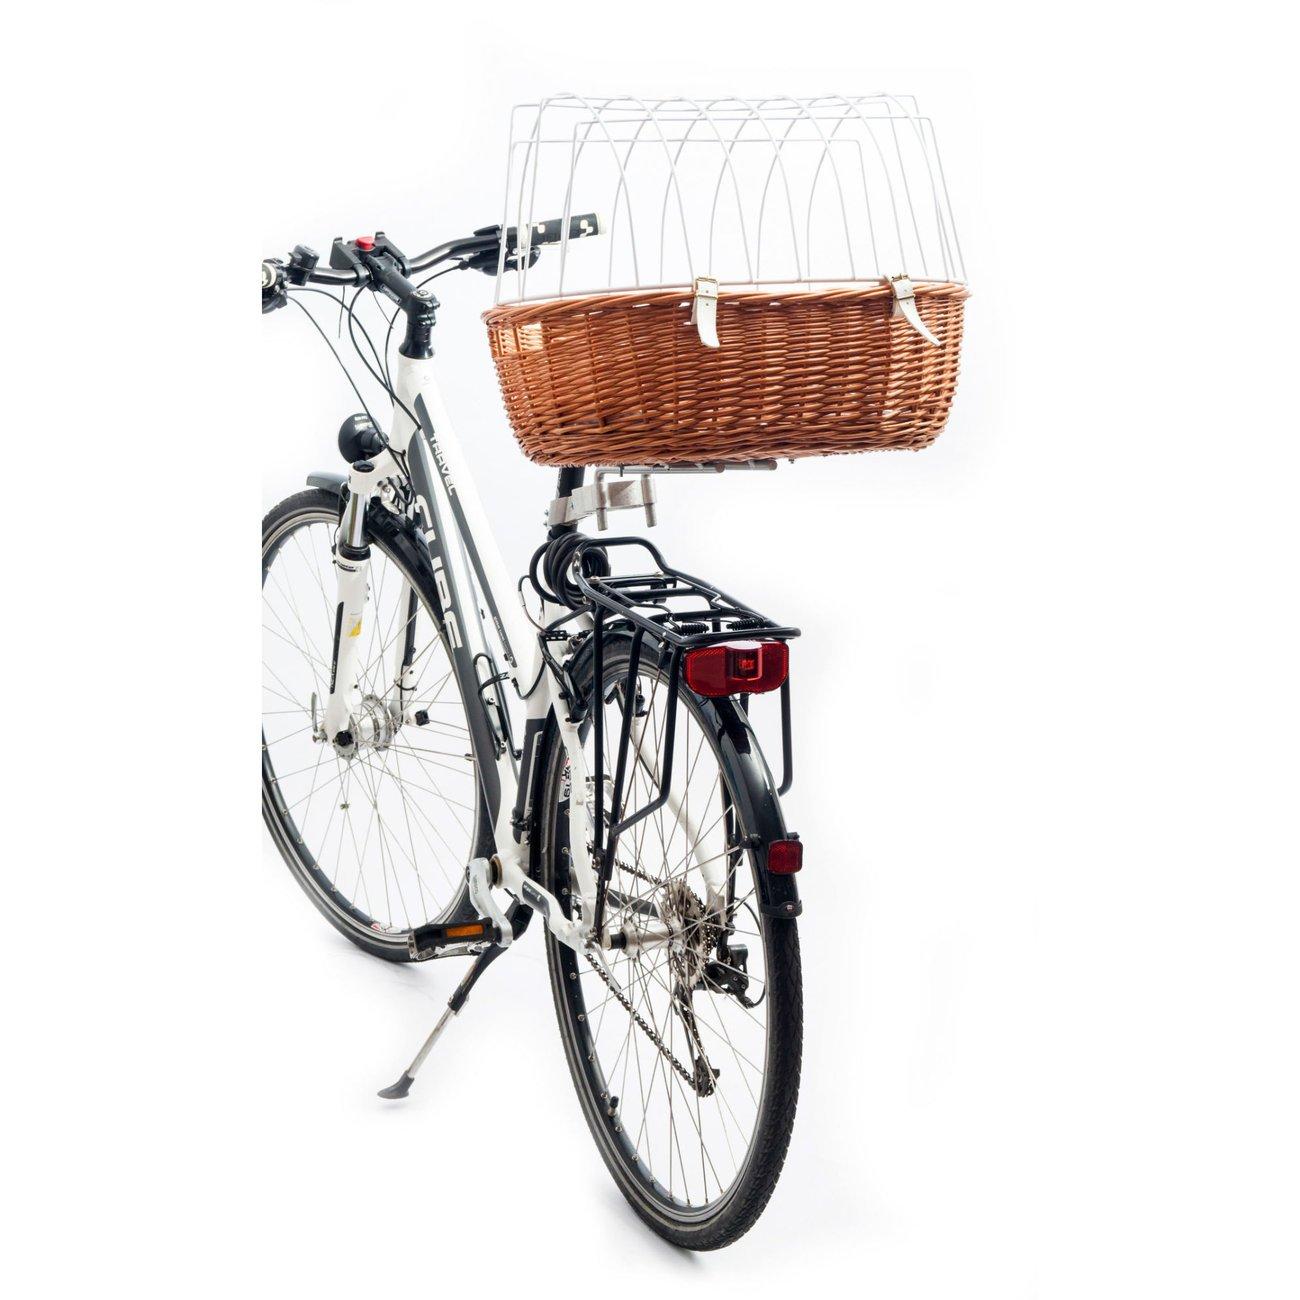 Aumüller Fahrradkorb für Hunde Rahmenmontage hinten, Bild 10